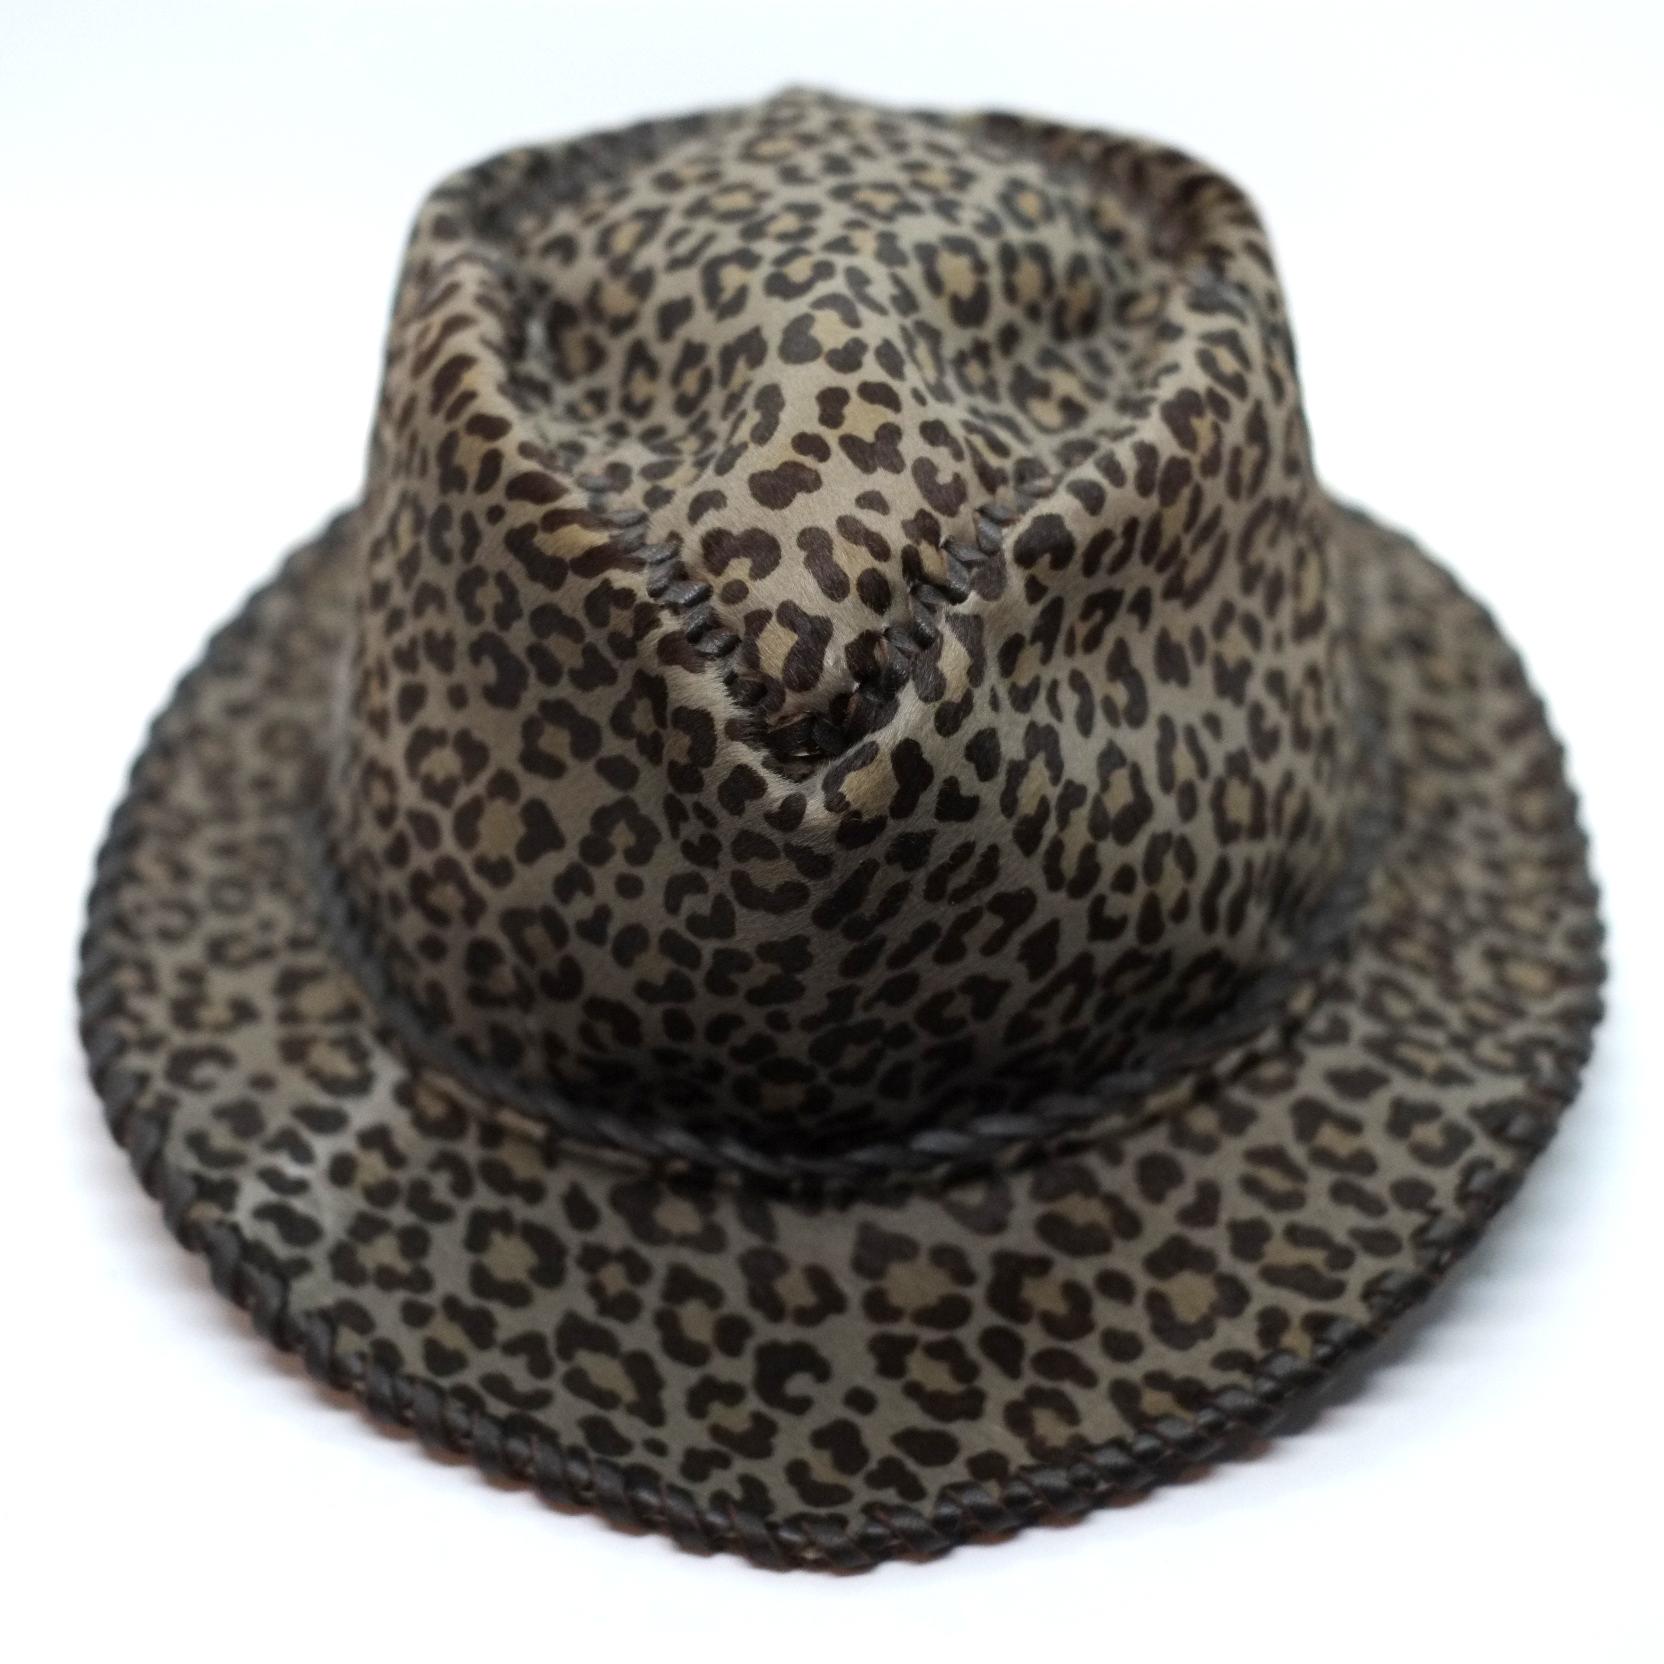 Bal-Hat-Neo レオパード 予約受付販売